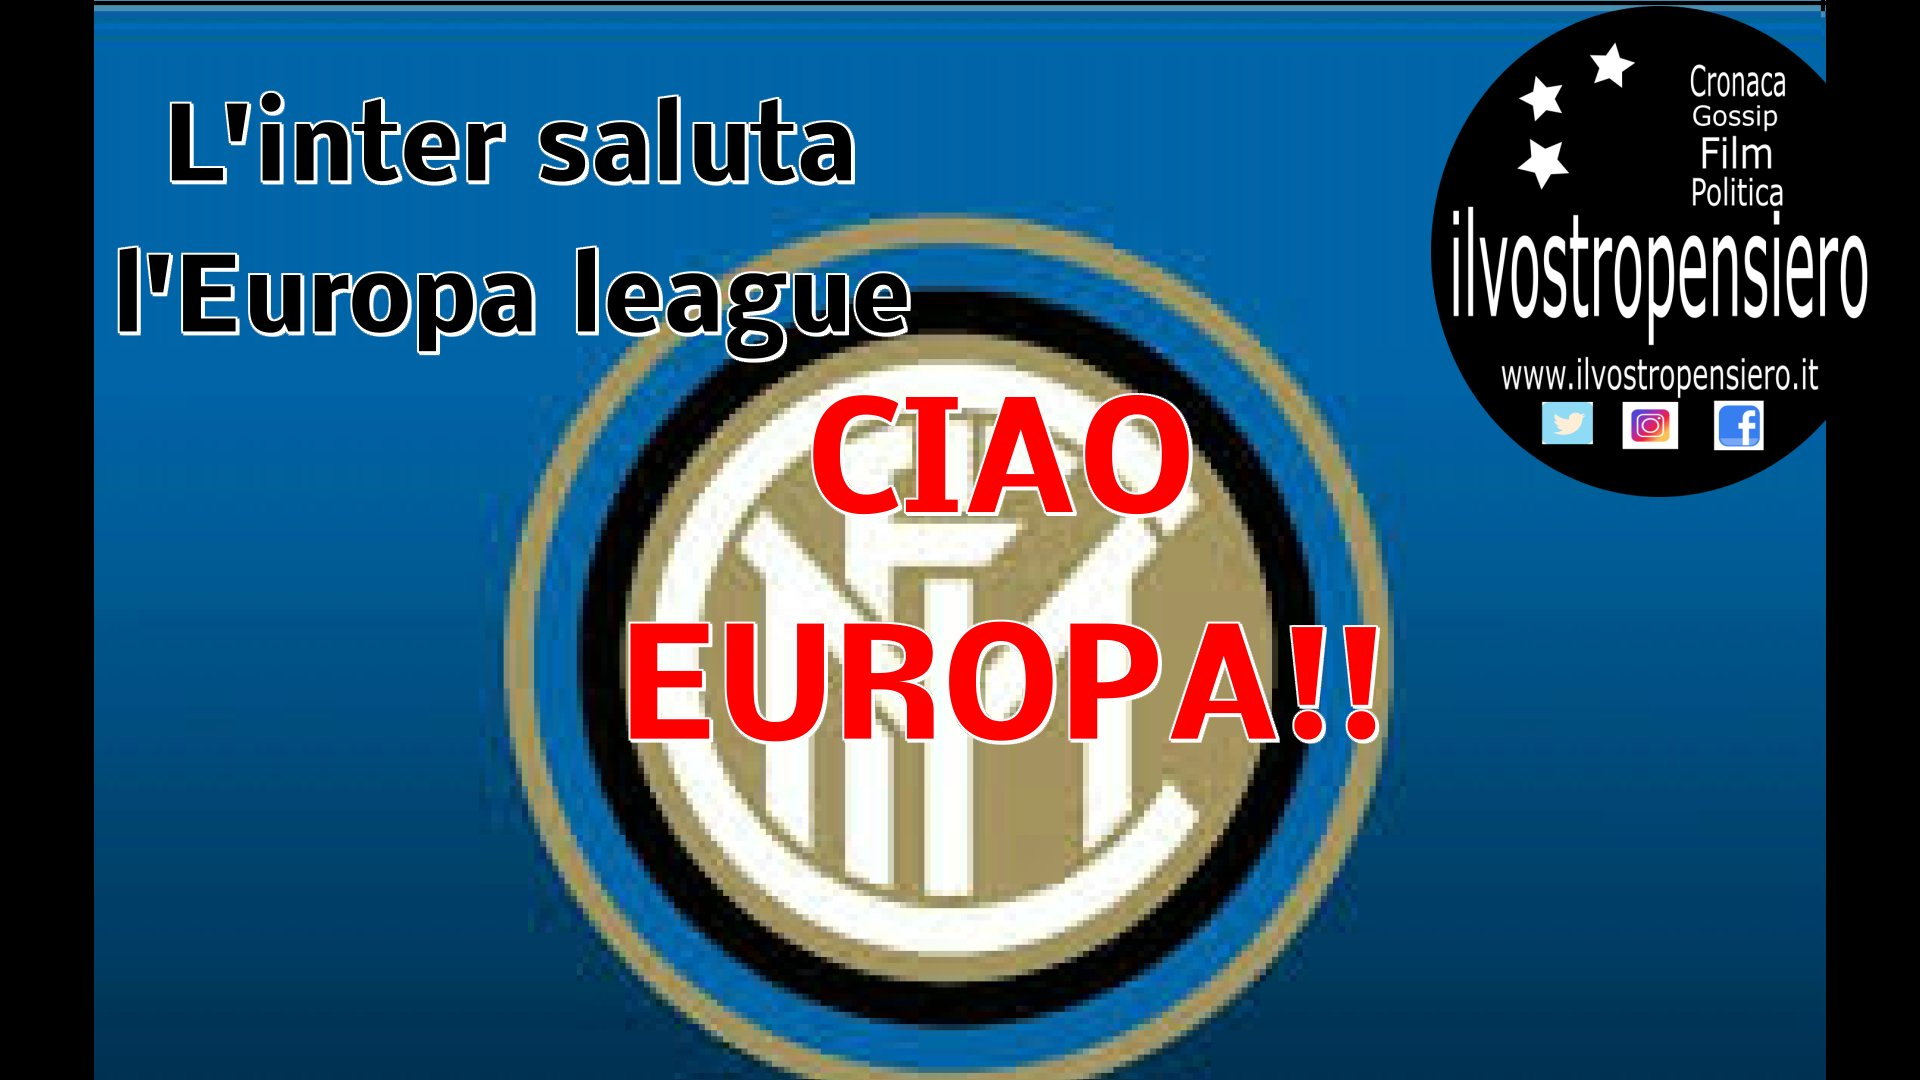 Inter saluta l'Europa League, CIAO Europa!Napoli perde 3 a 1 a Salisburgo ma passa ai quarti